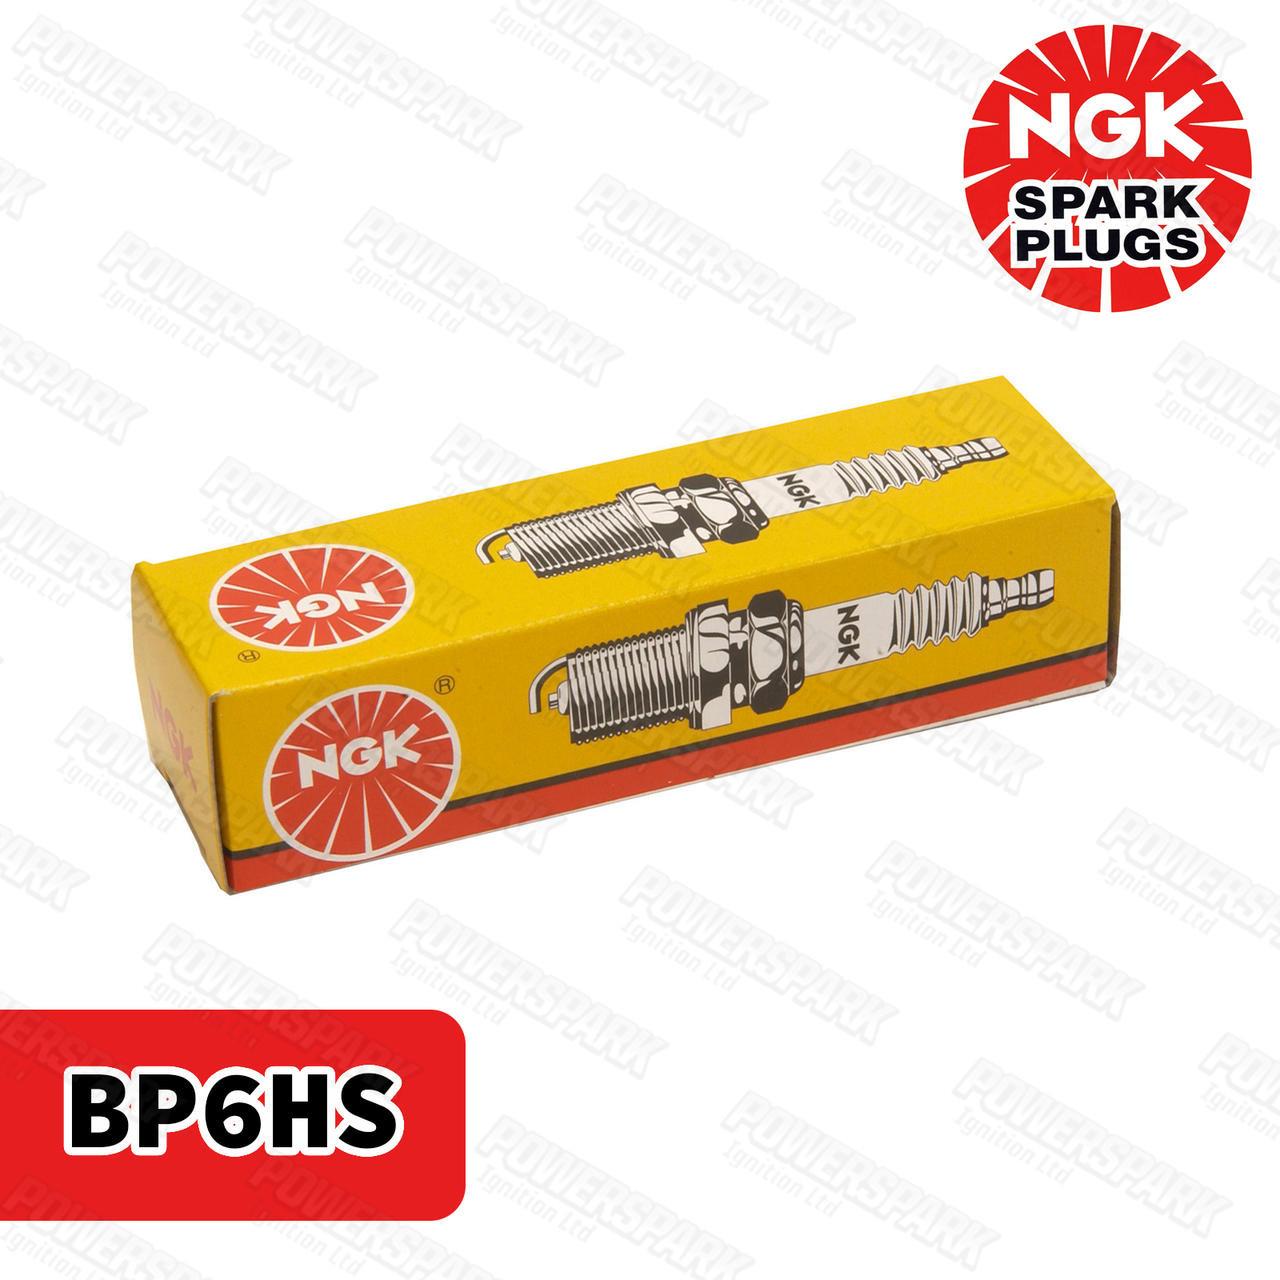 NGK Spark Plugs NGK BP6HS Spark Plug